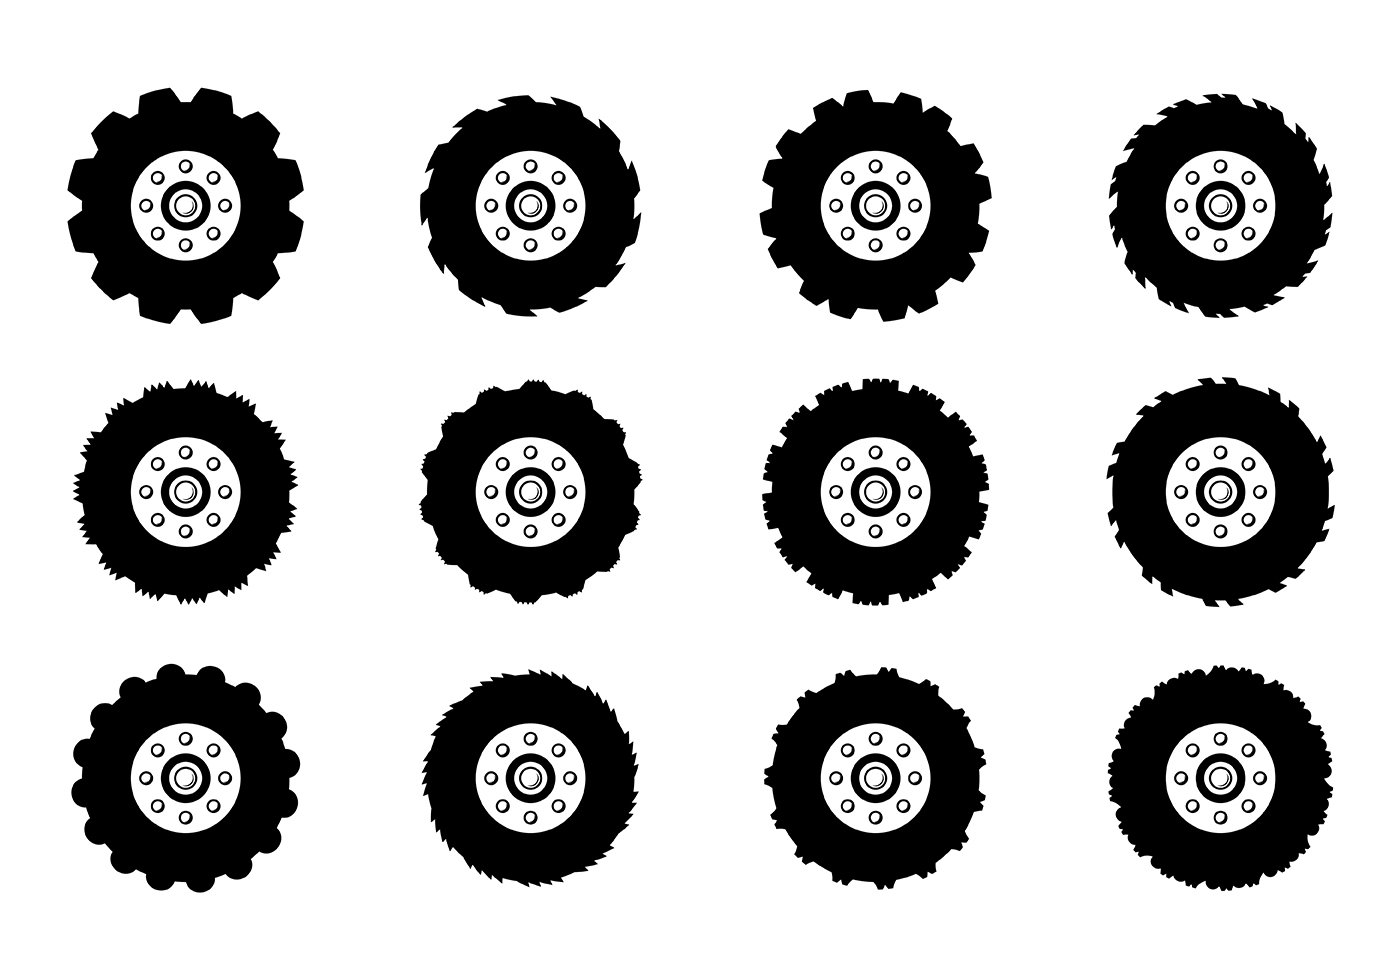 Muddy Tractor Clip Art : Tractor tire vector download free art stock